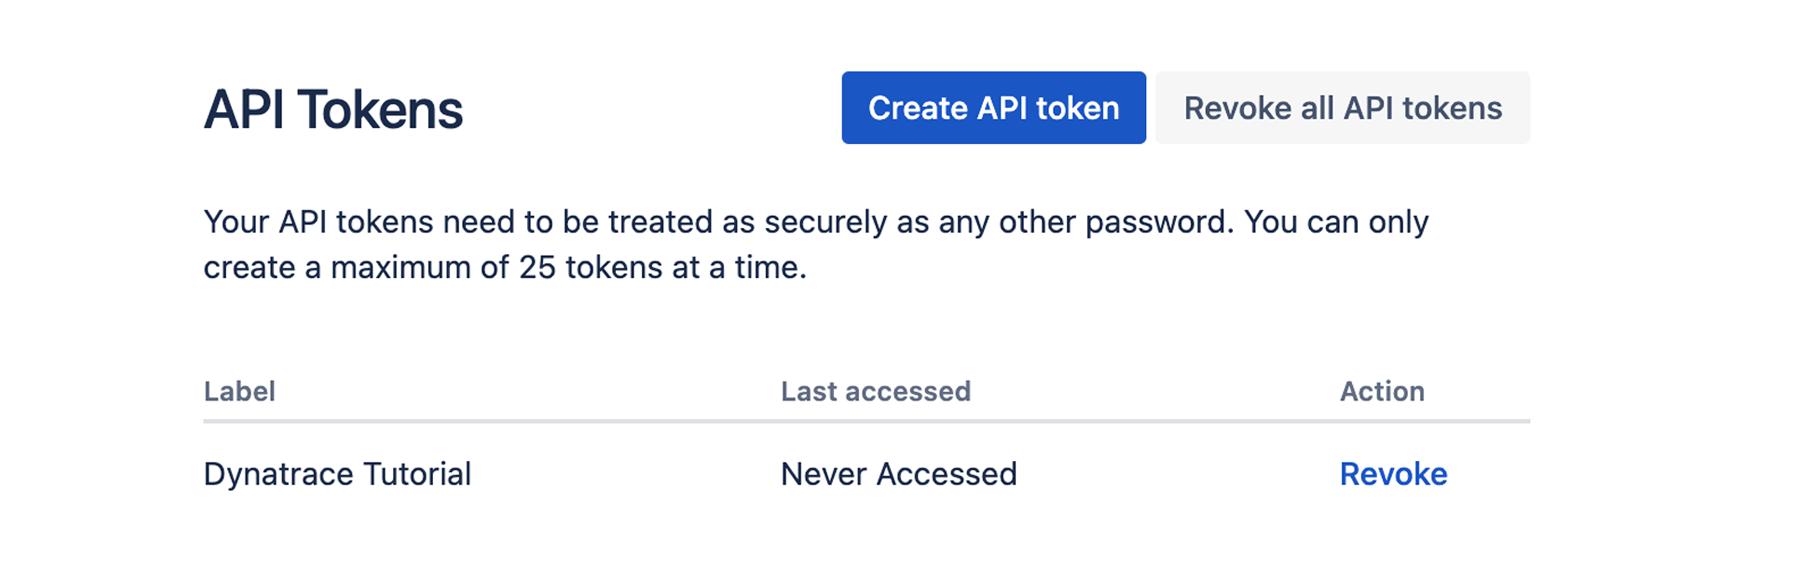 API tokens window